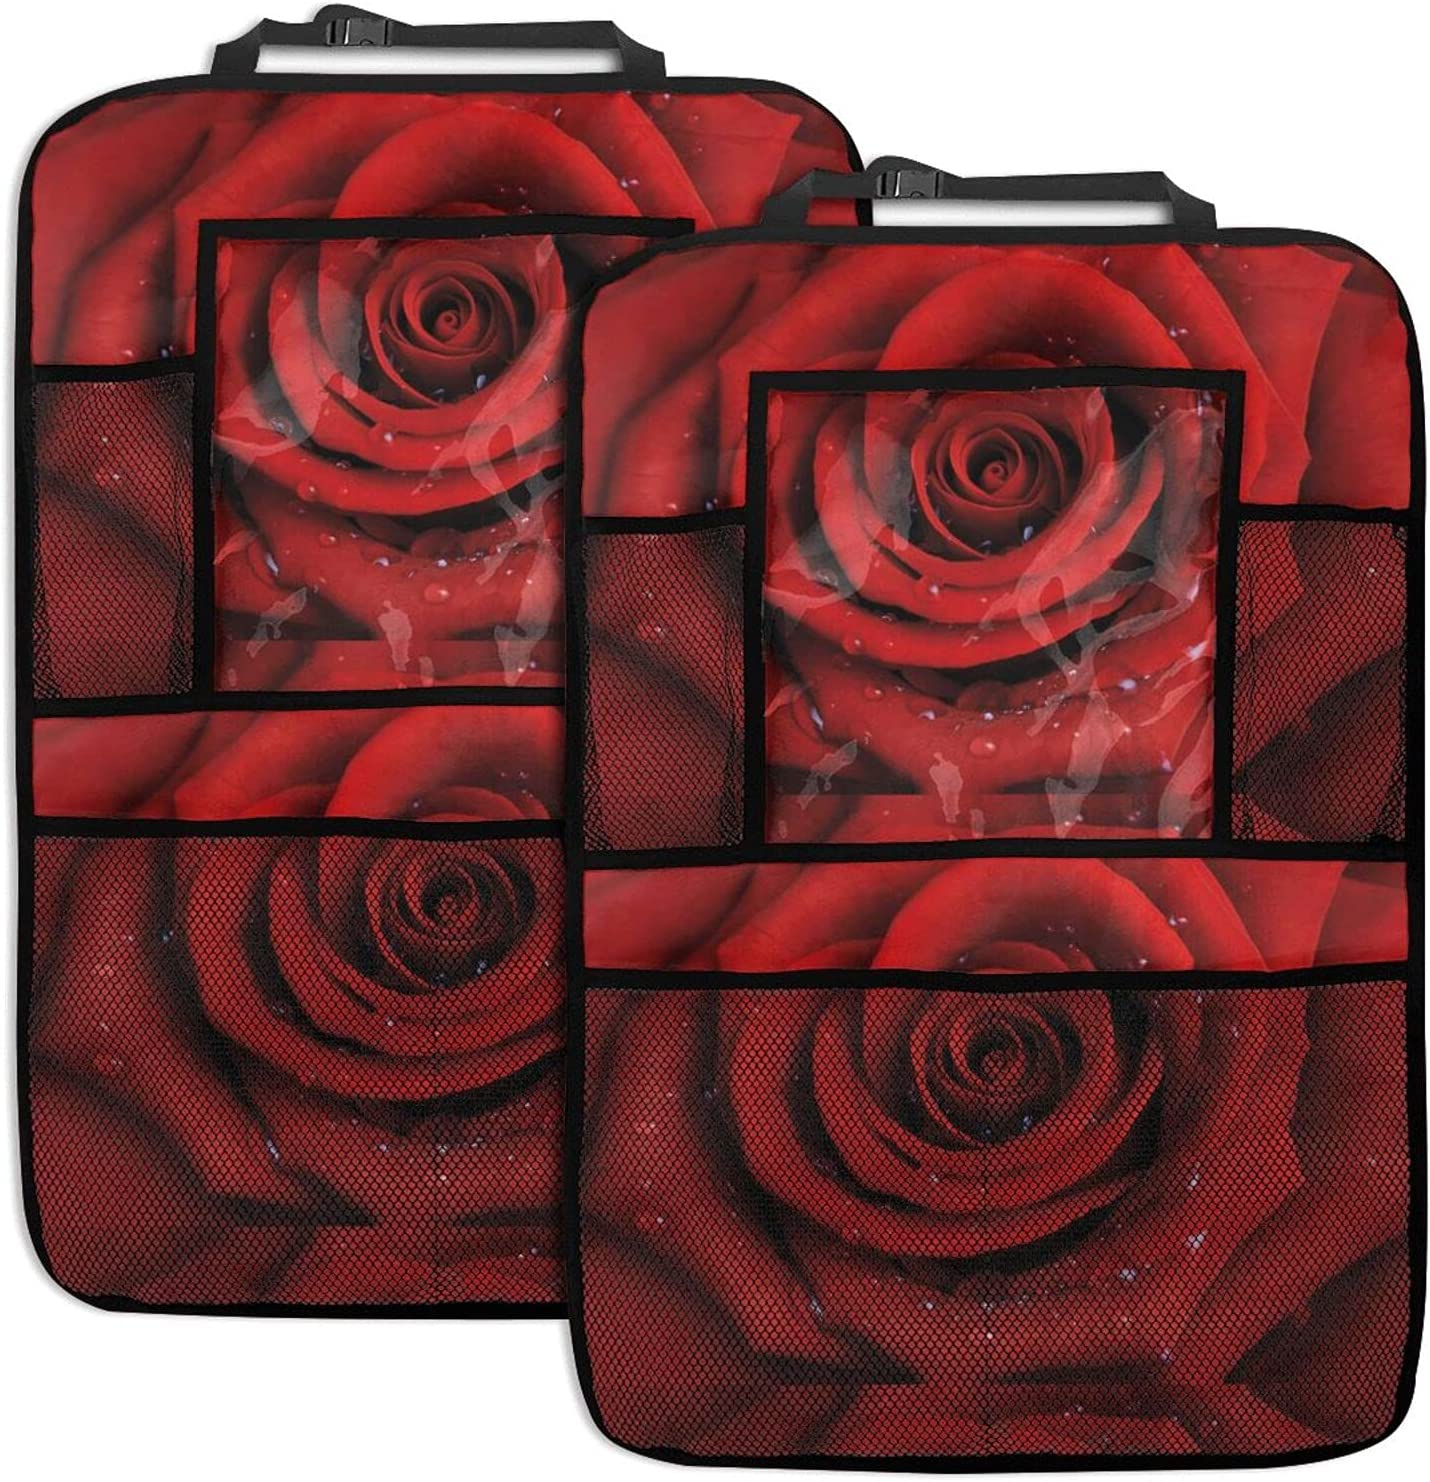 Rose Flower Car Seat Back Max Outlet SALE 42% OFF Organizer Function Multi Orga